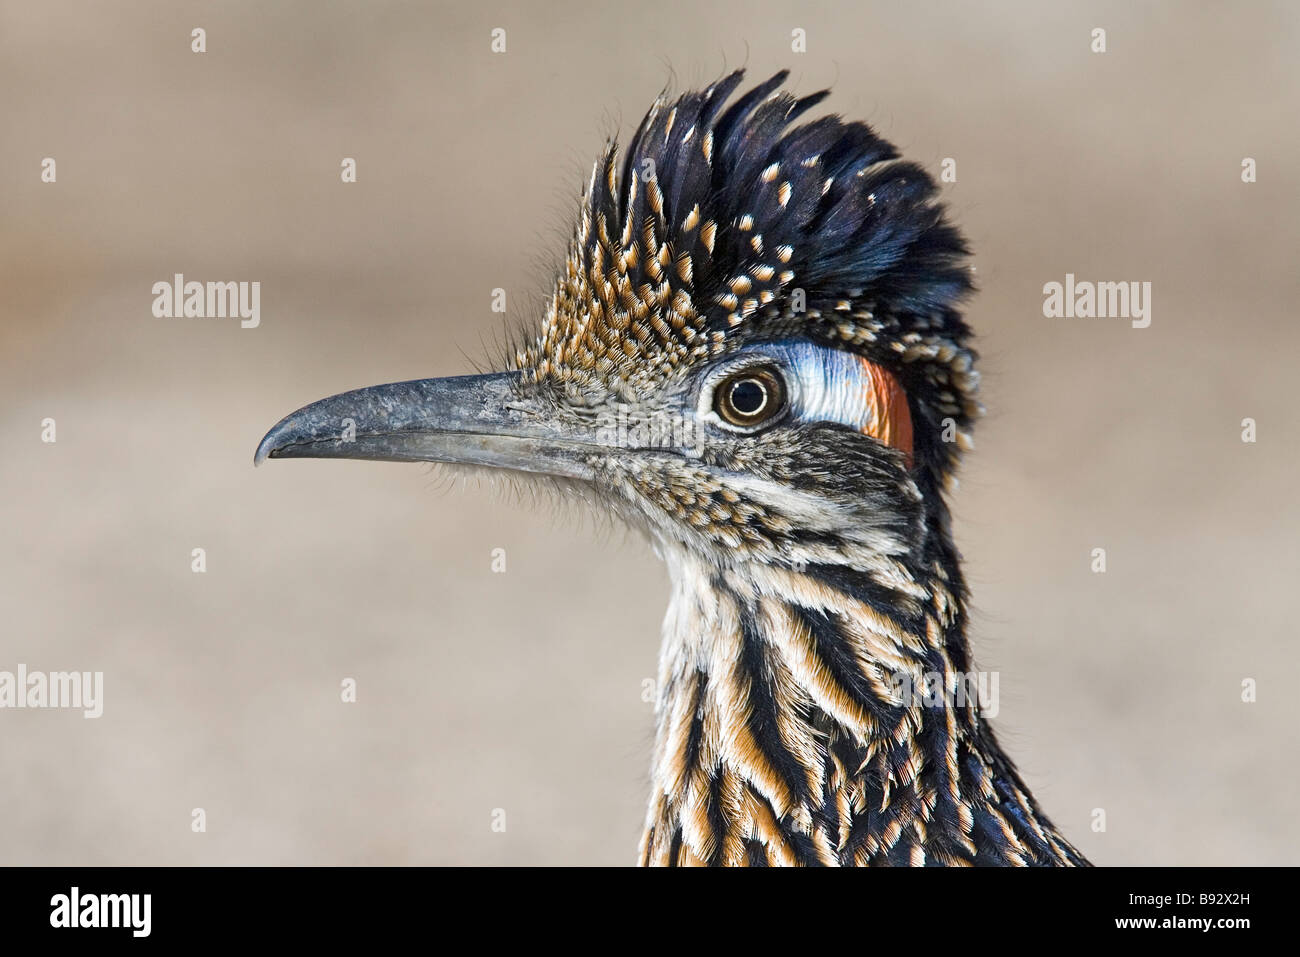 Greater Roadrunner Geococcyx californianus Tucson Pima County Arizona United States 15 March Adult Cuculidae - Stock Image